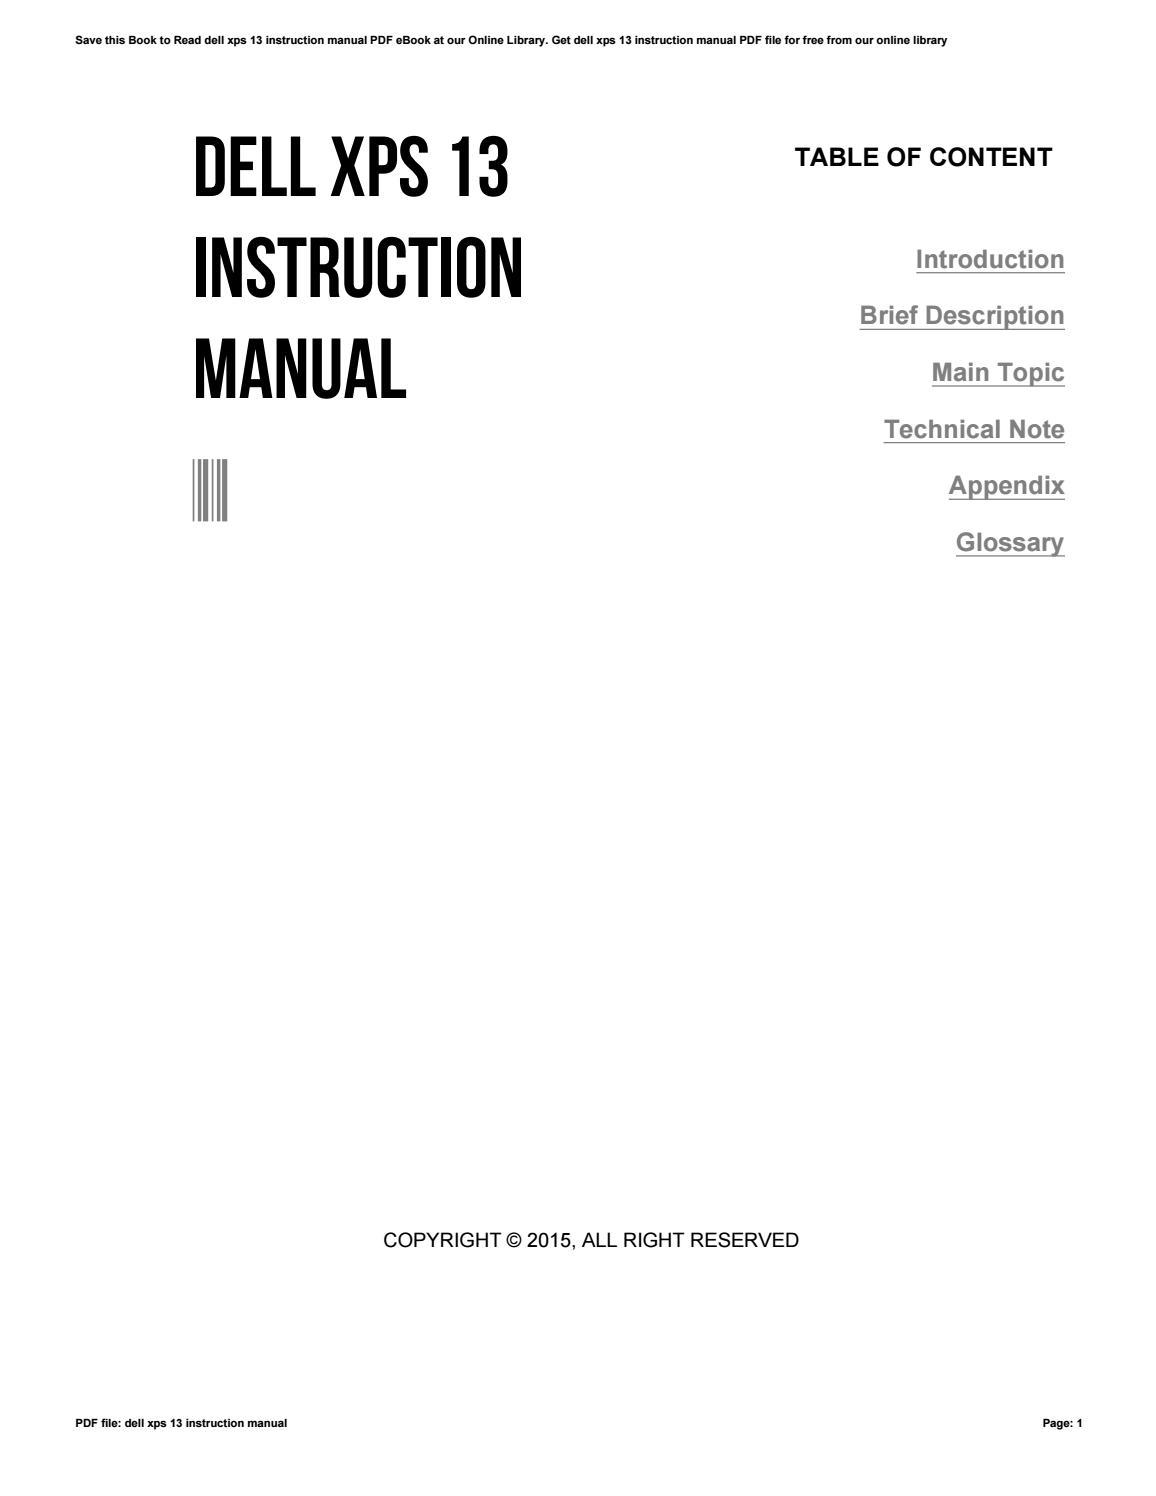 Bestseller: Dell Xps 13 Manual